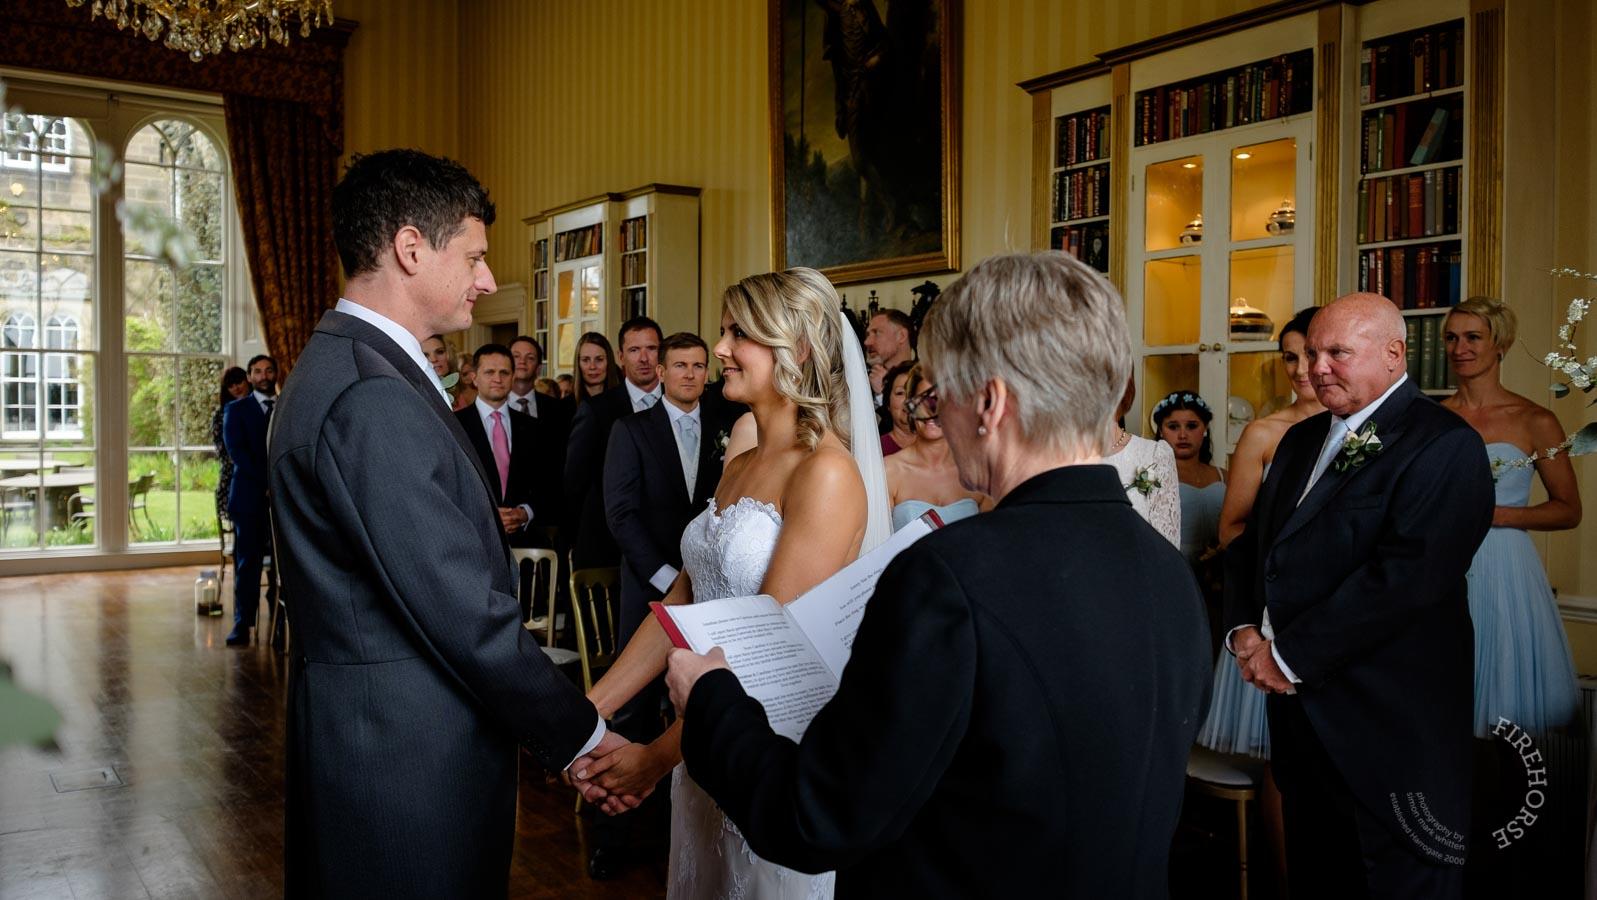 Swinton-Park-Spring-Wedding-205